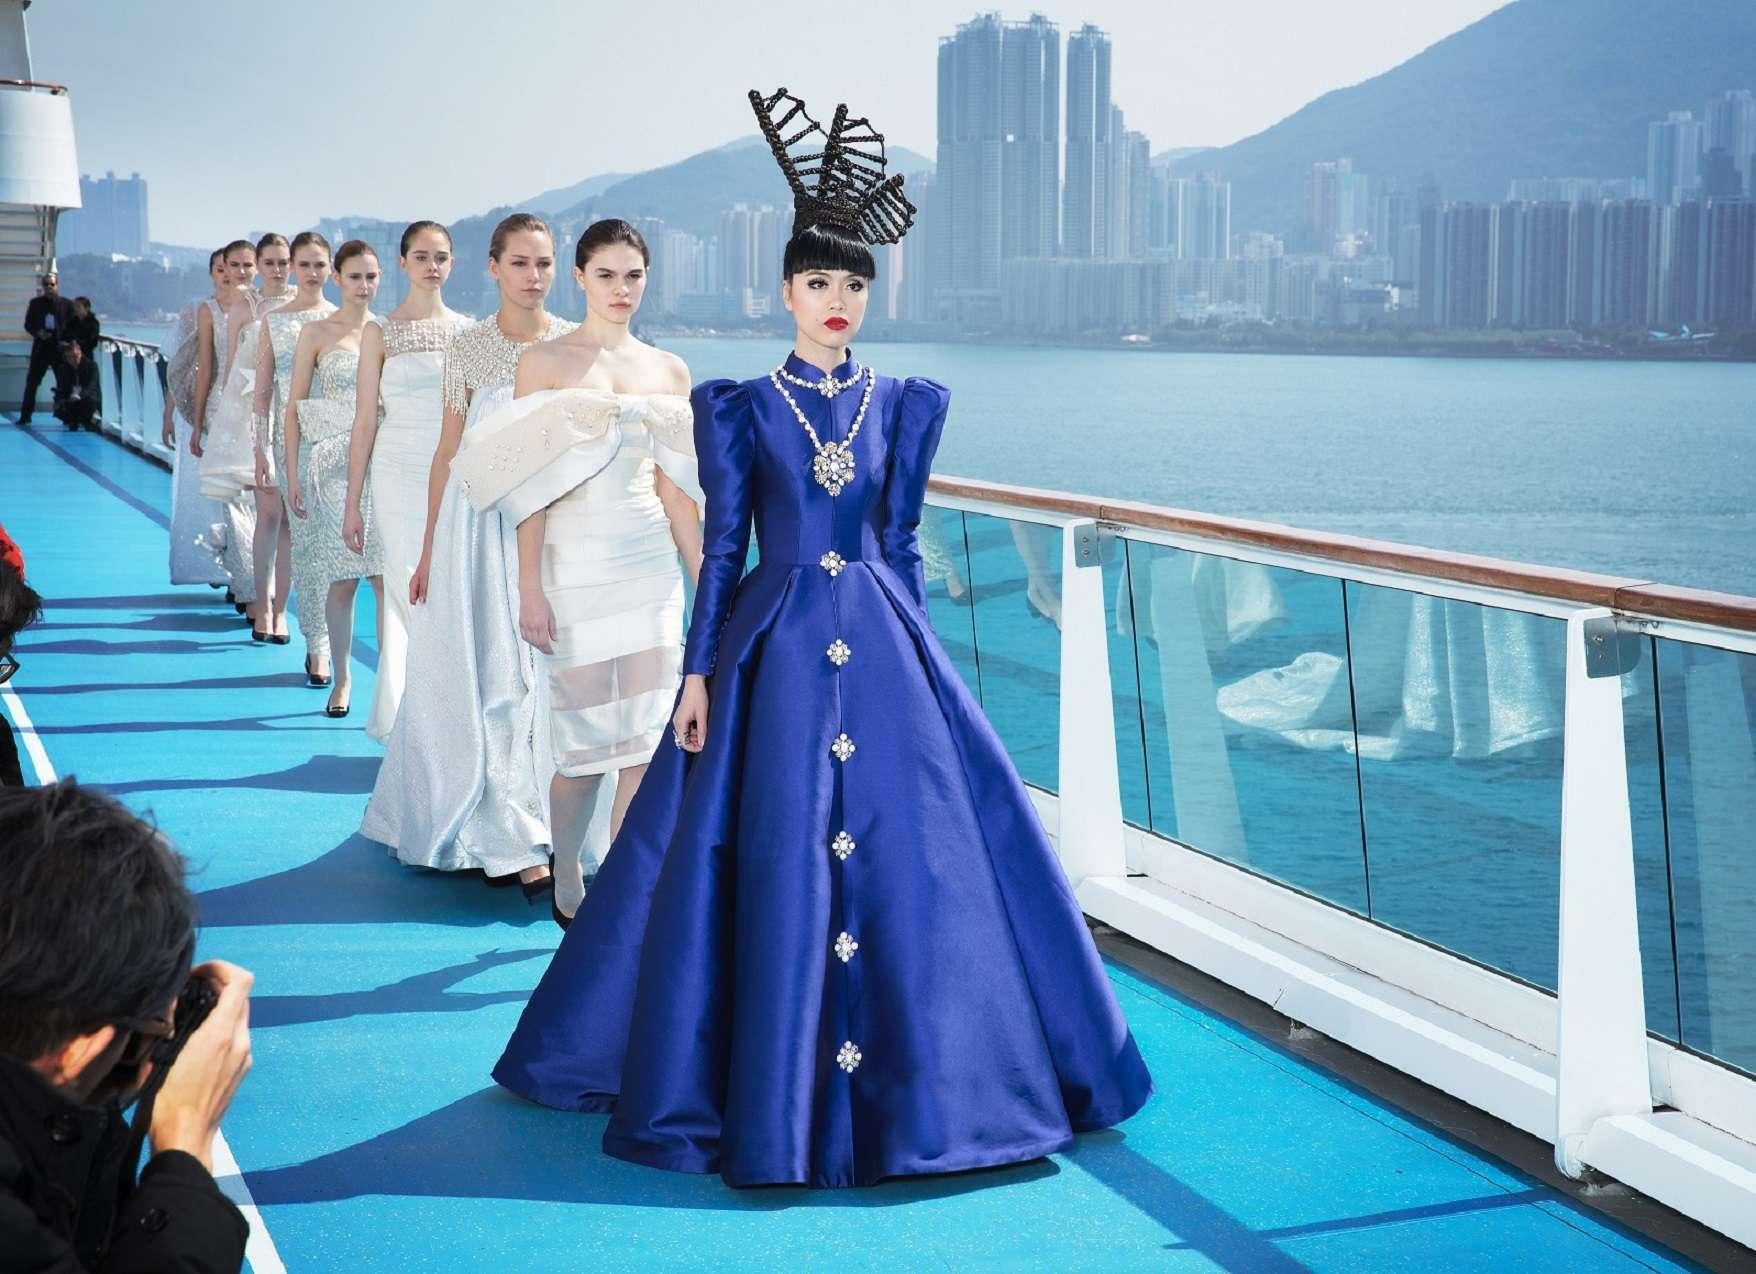 Jessica Minh Anh on Costa neoRomantica in Xiao Fen design FINALE